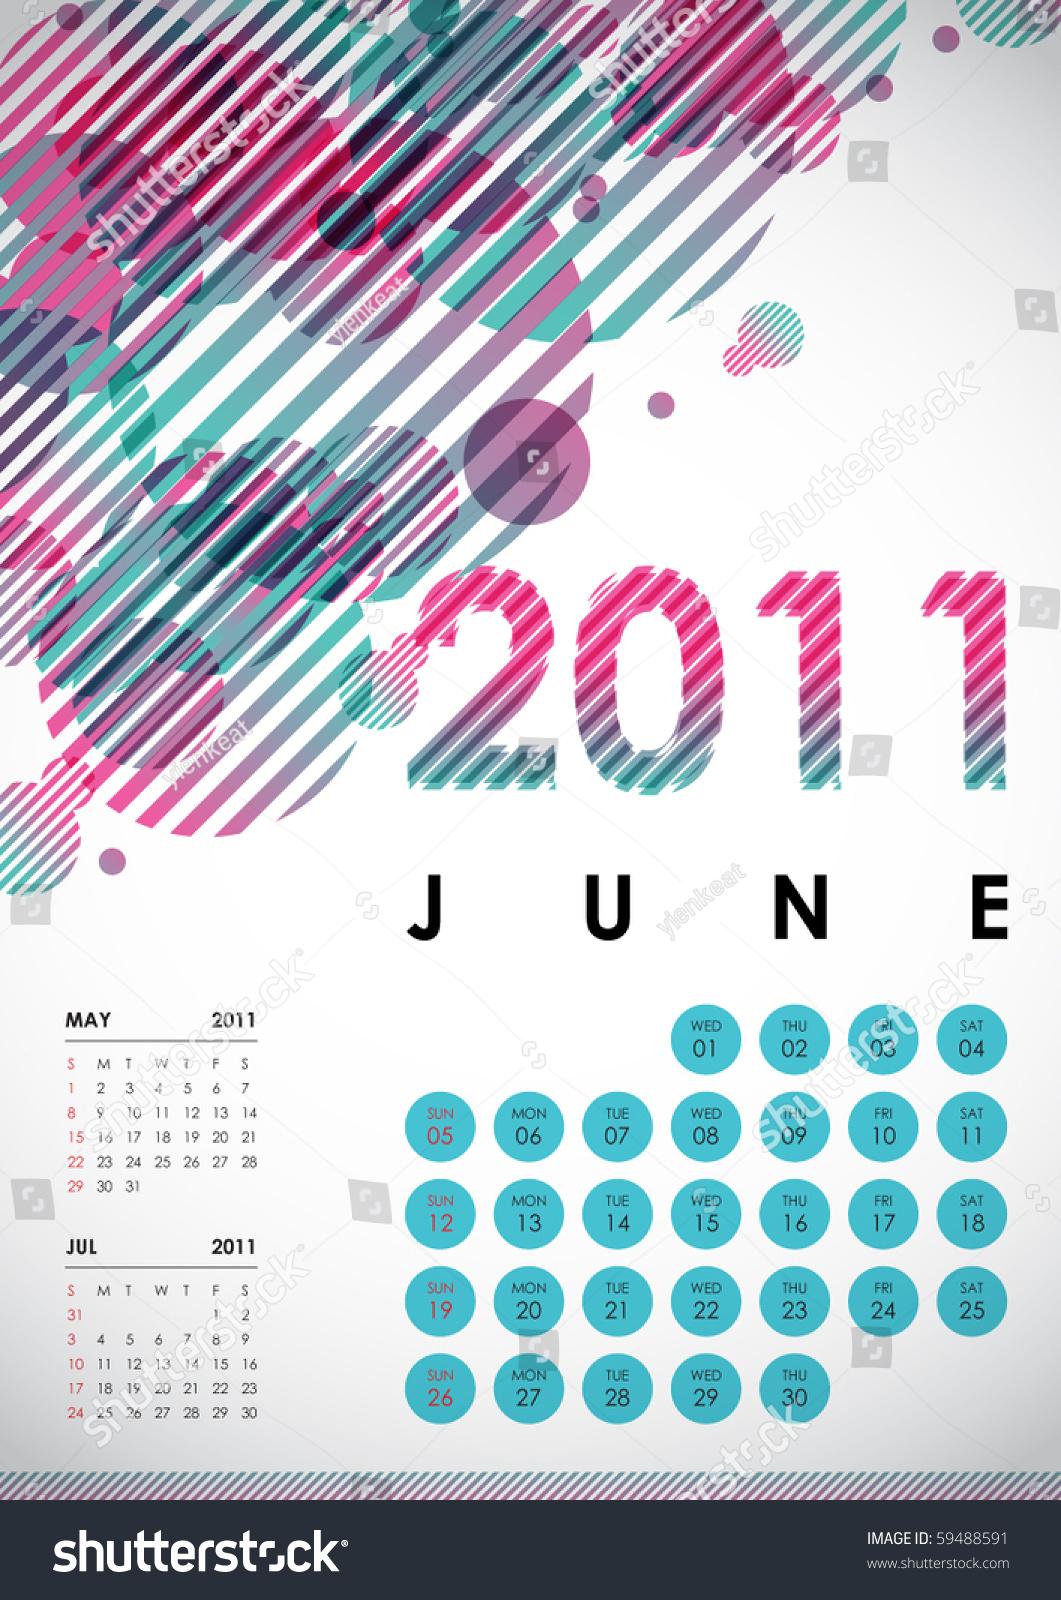 June Calendar Vector : June calendar design stock vector illustration